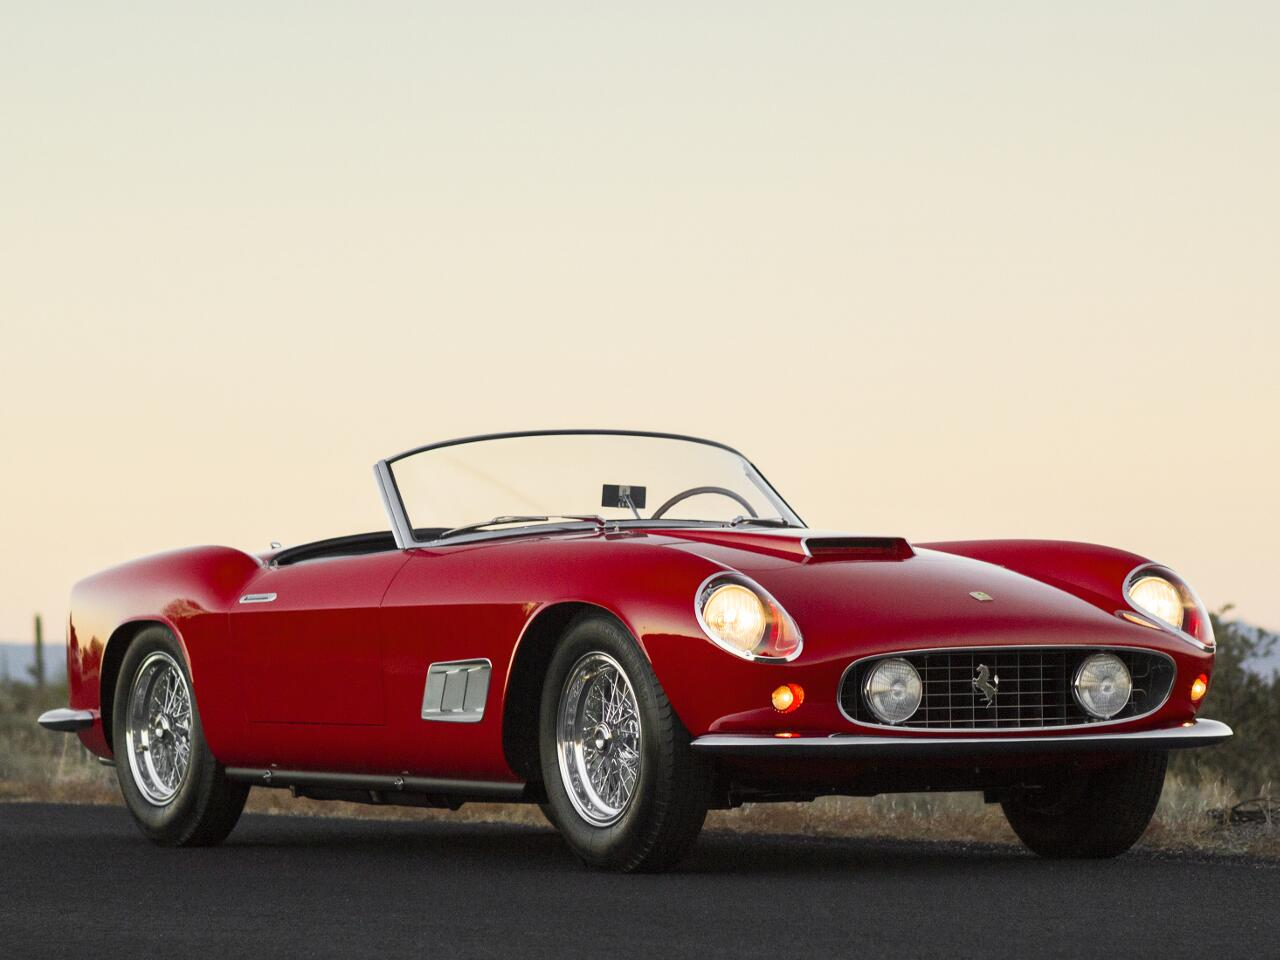 Bild zu Platz 7: Ferrari 250 GT California Spyder LWB